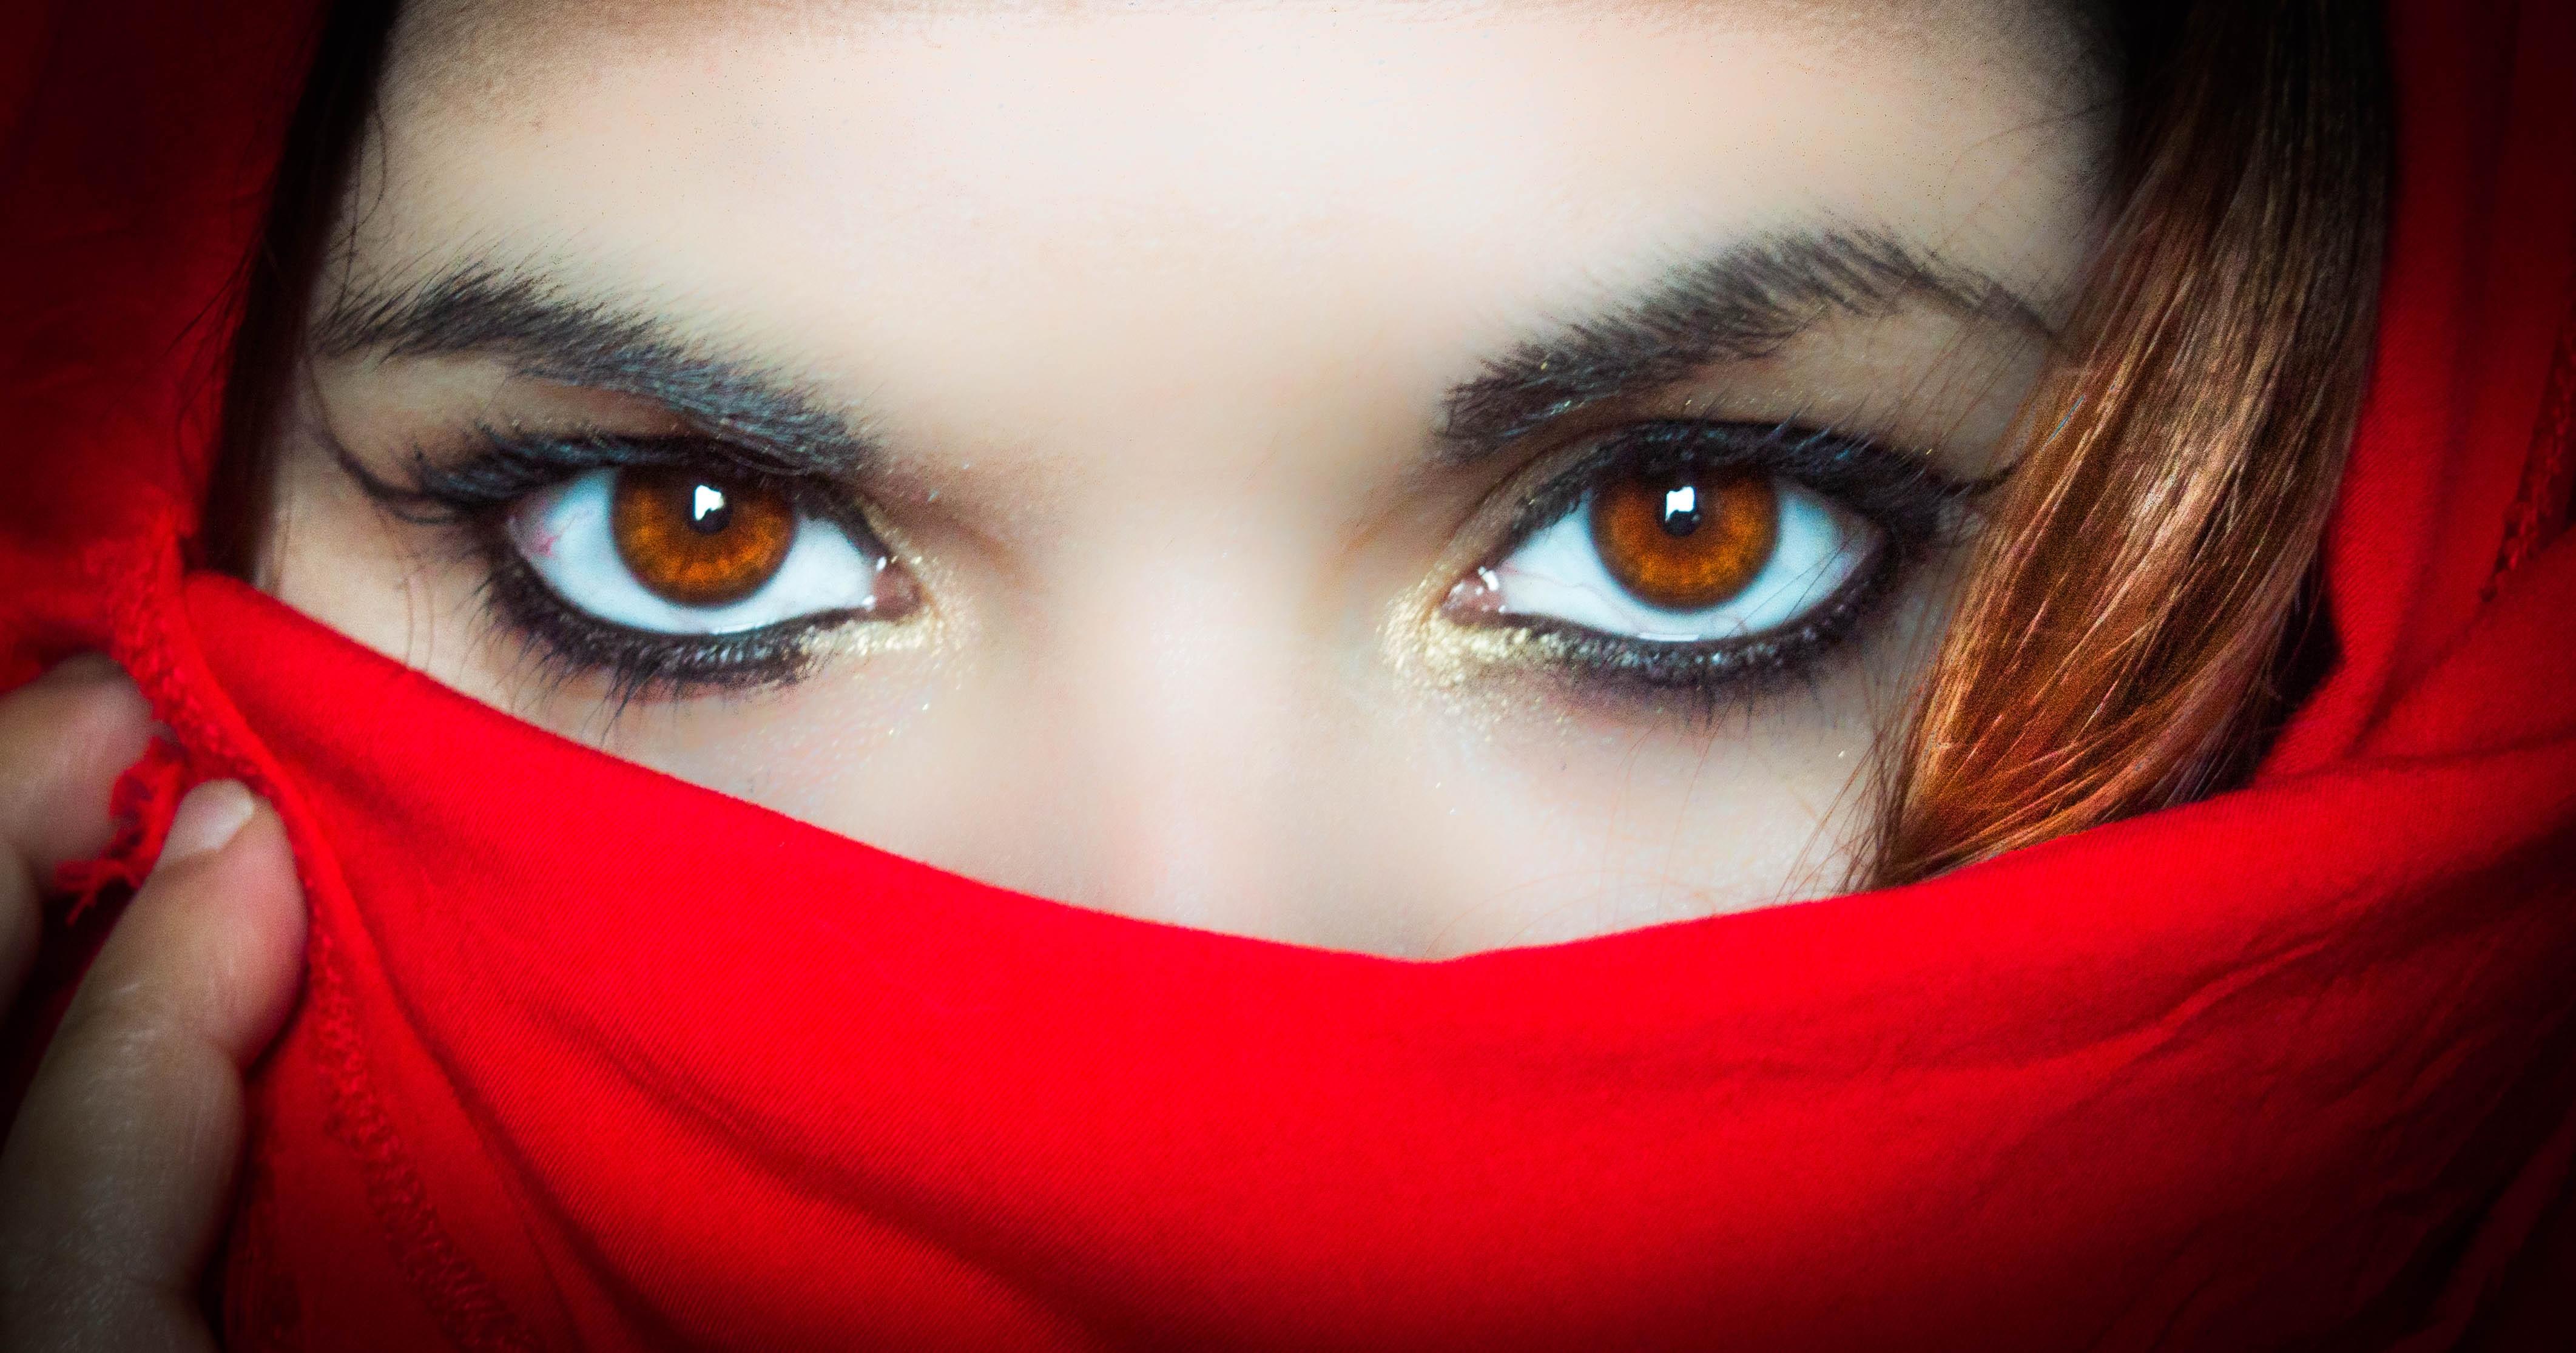 Картинки глаза девочек